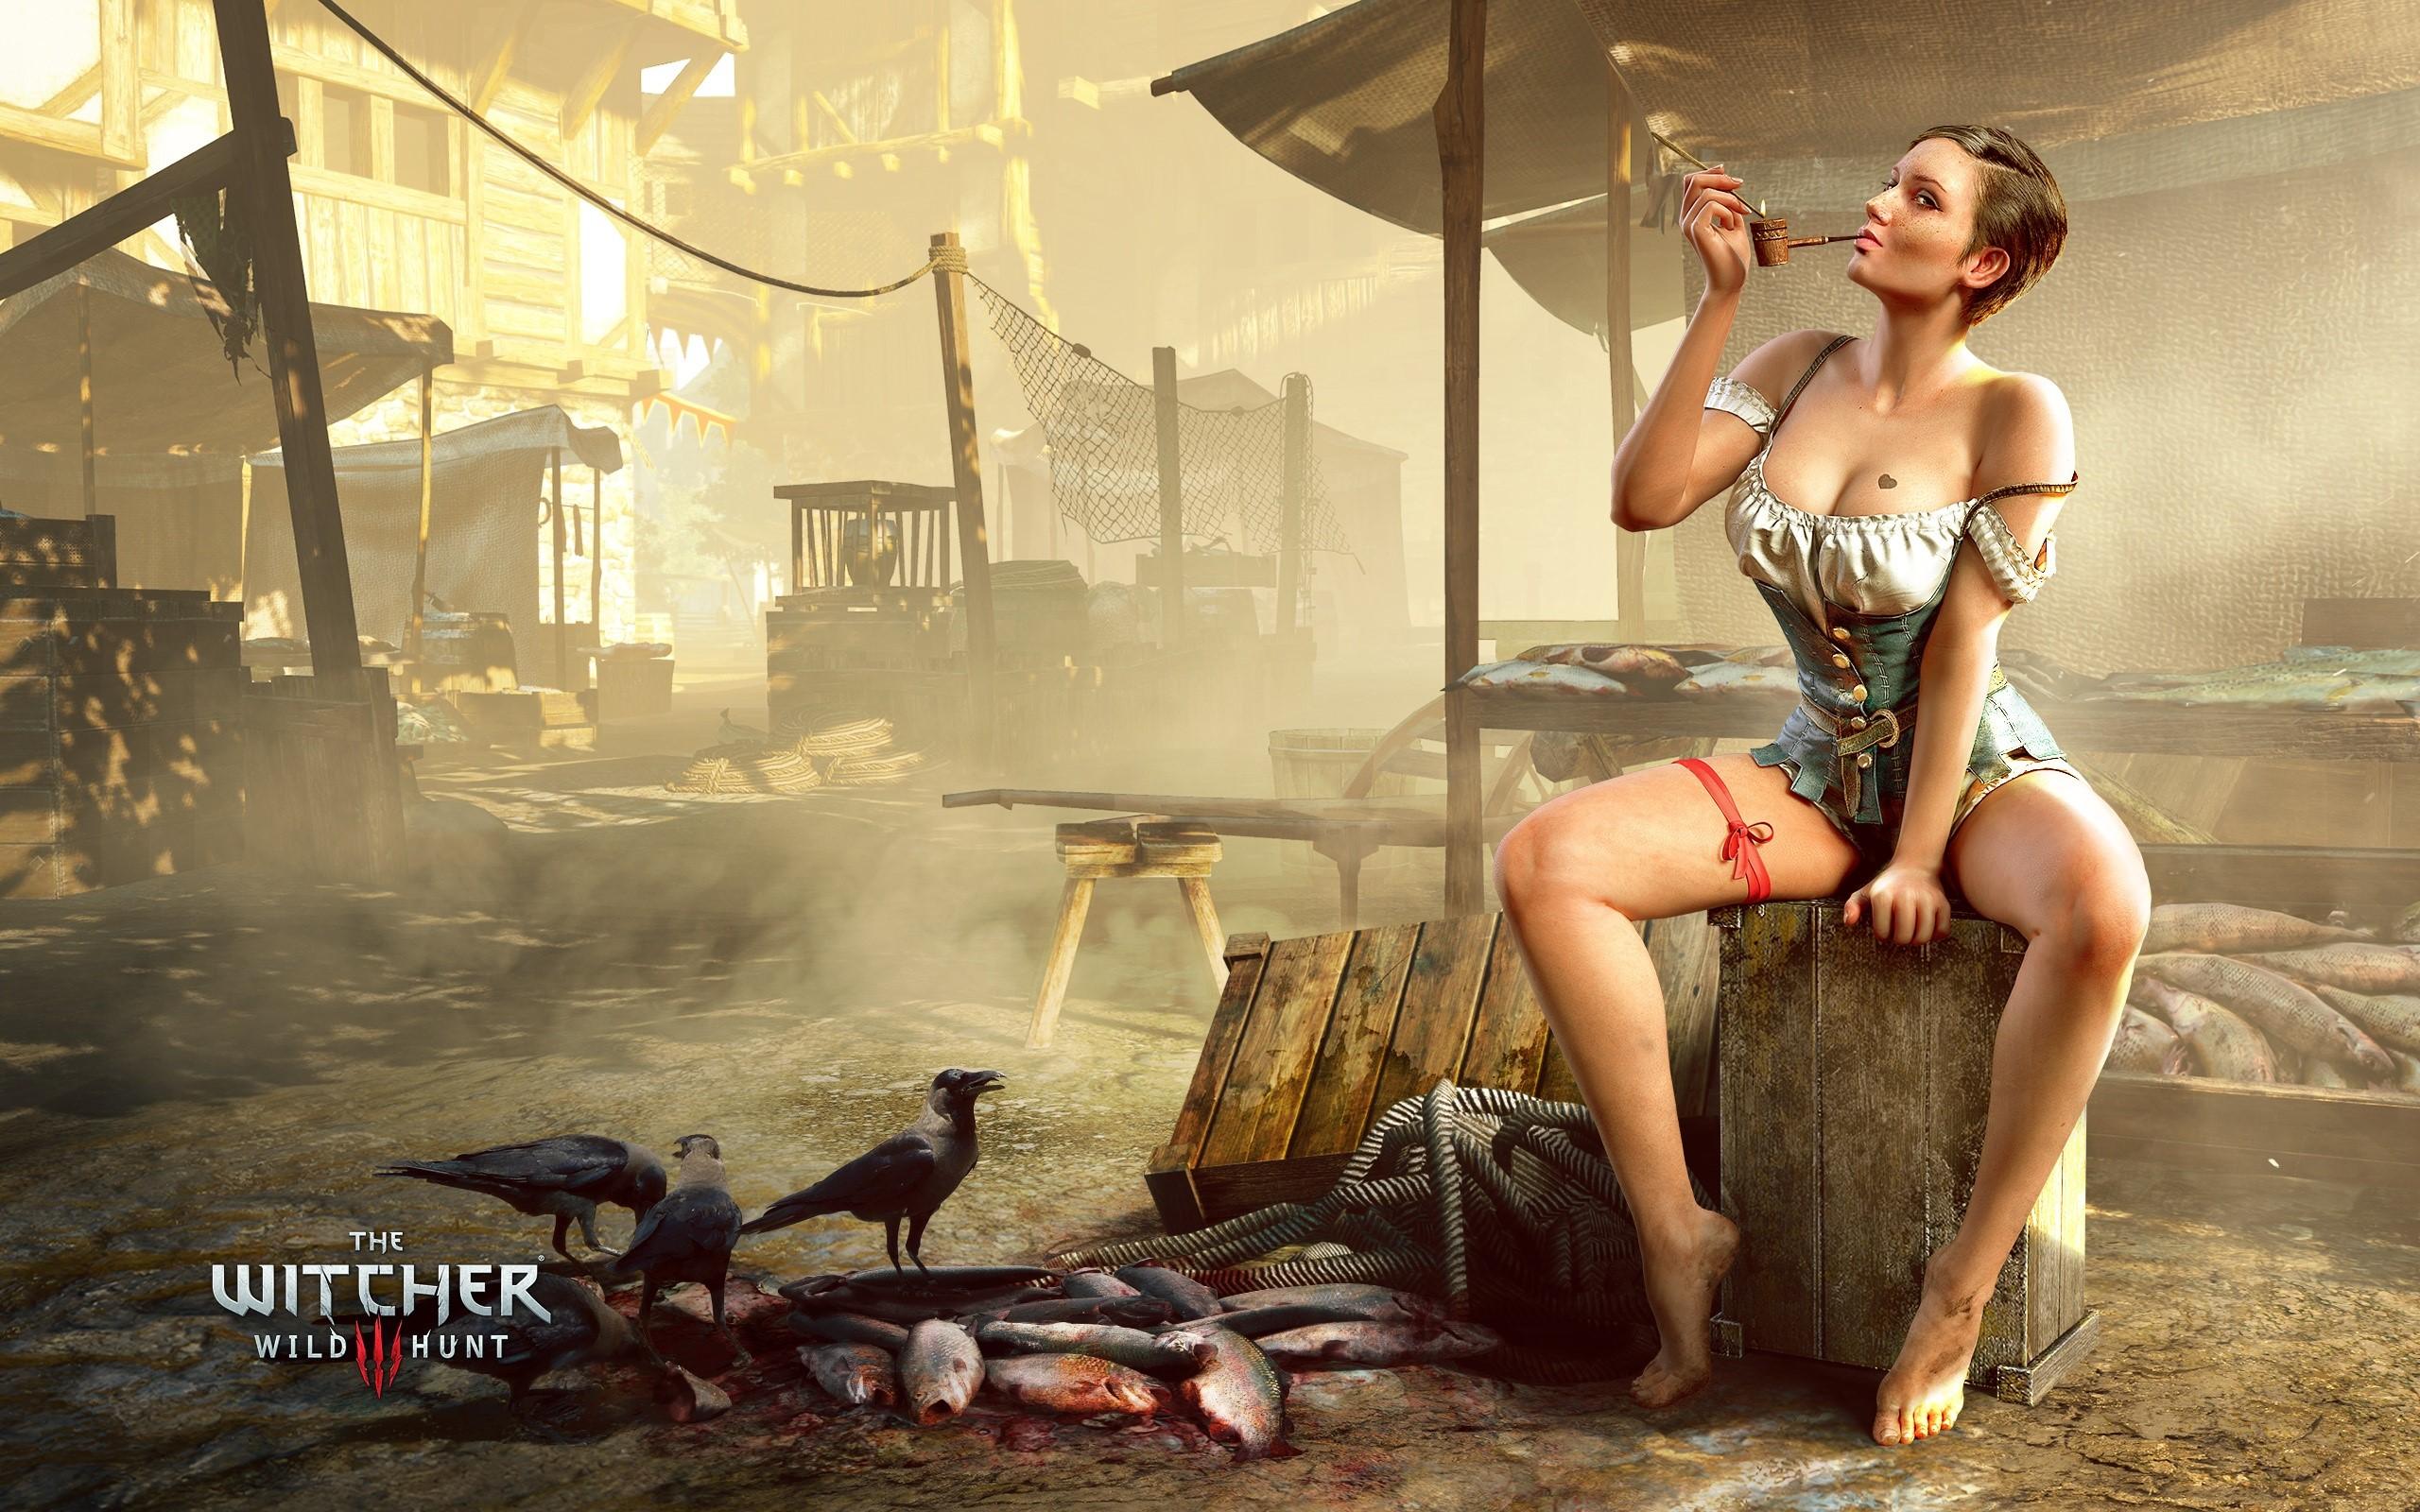 Fondo de pantalla de Strumpet de Witcher 3 Wild Hunt Imágenes